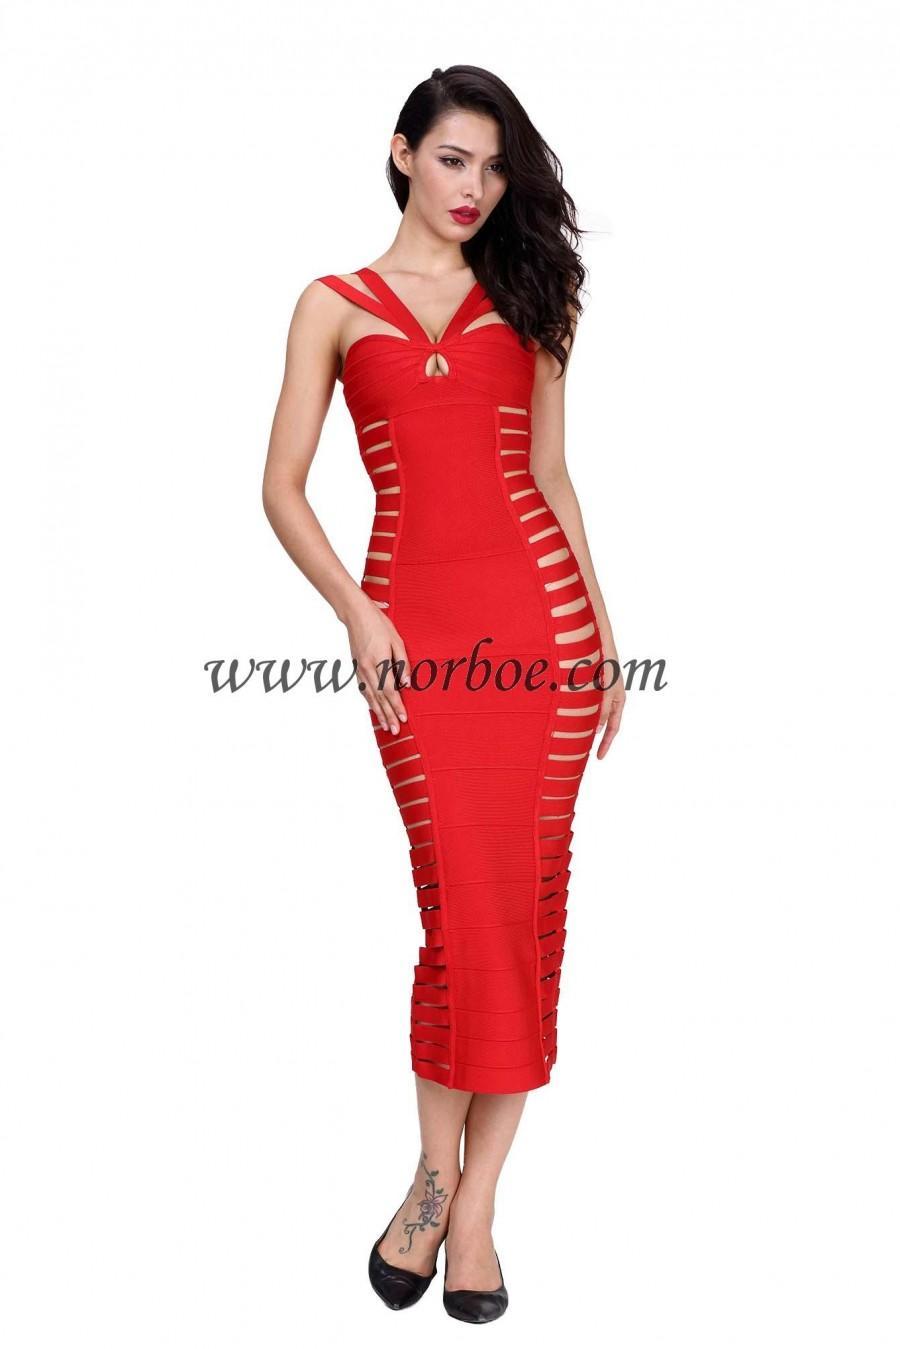 Wedding - Norboe Red Formal Evening Dress